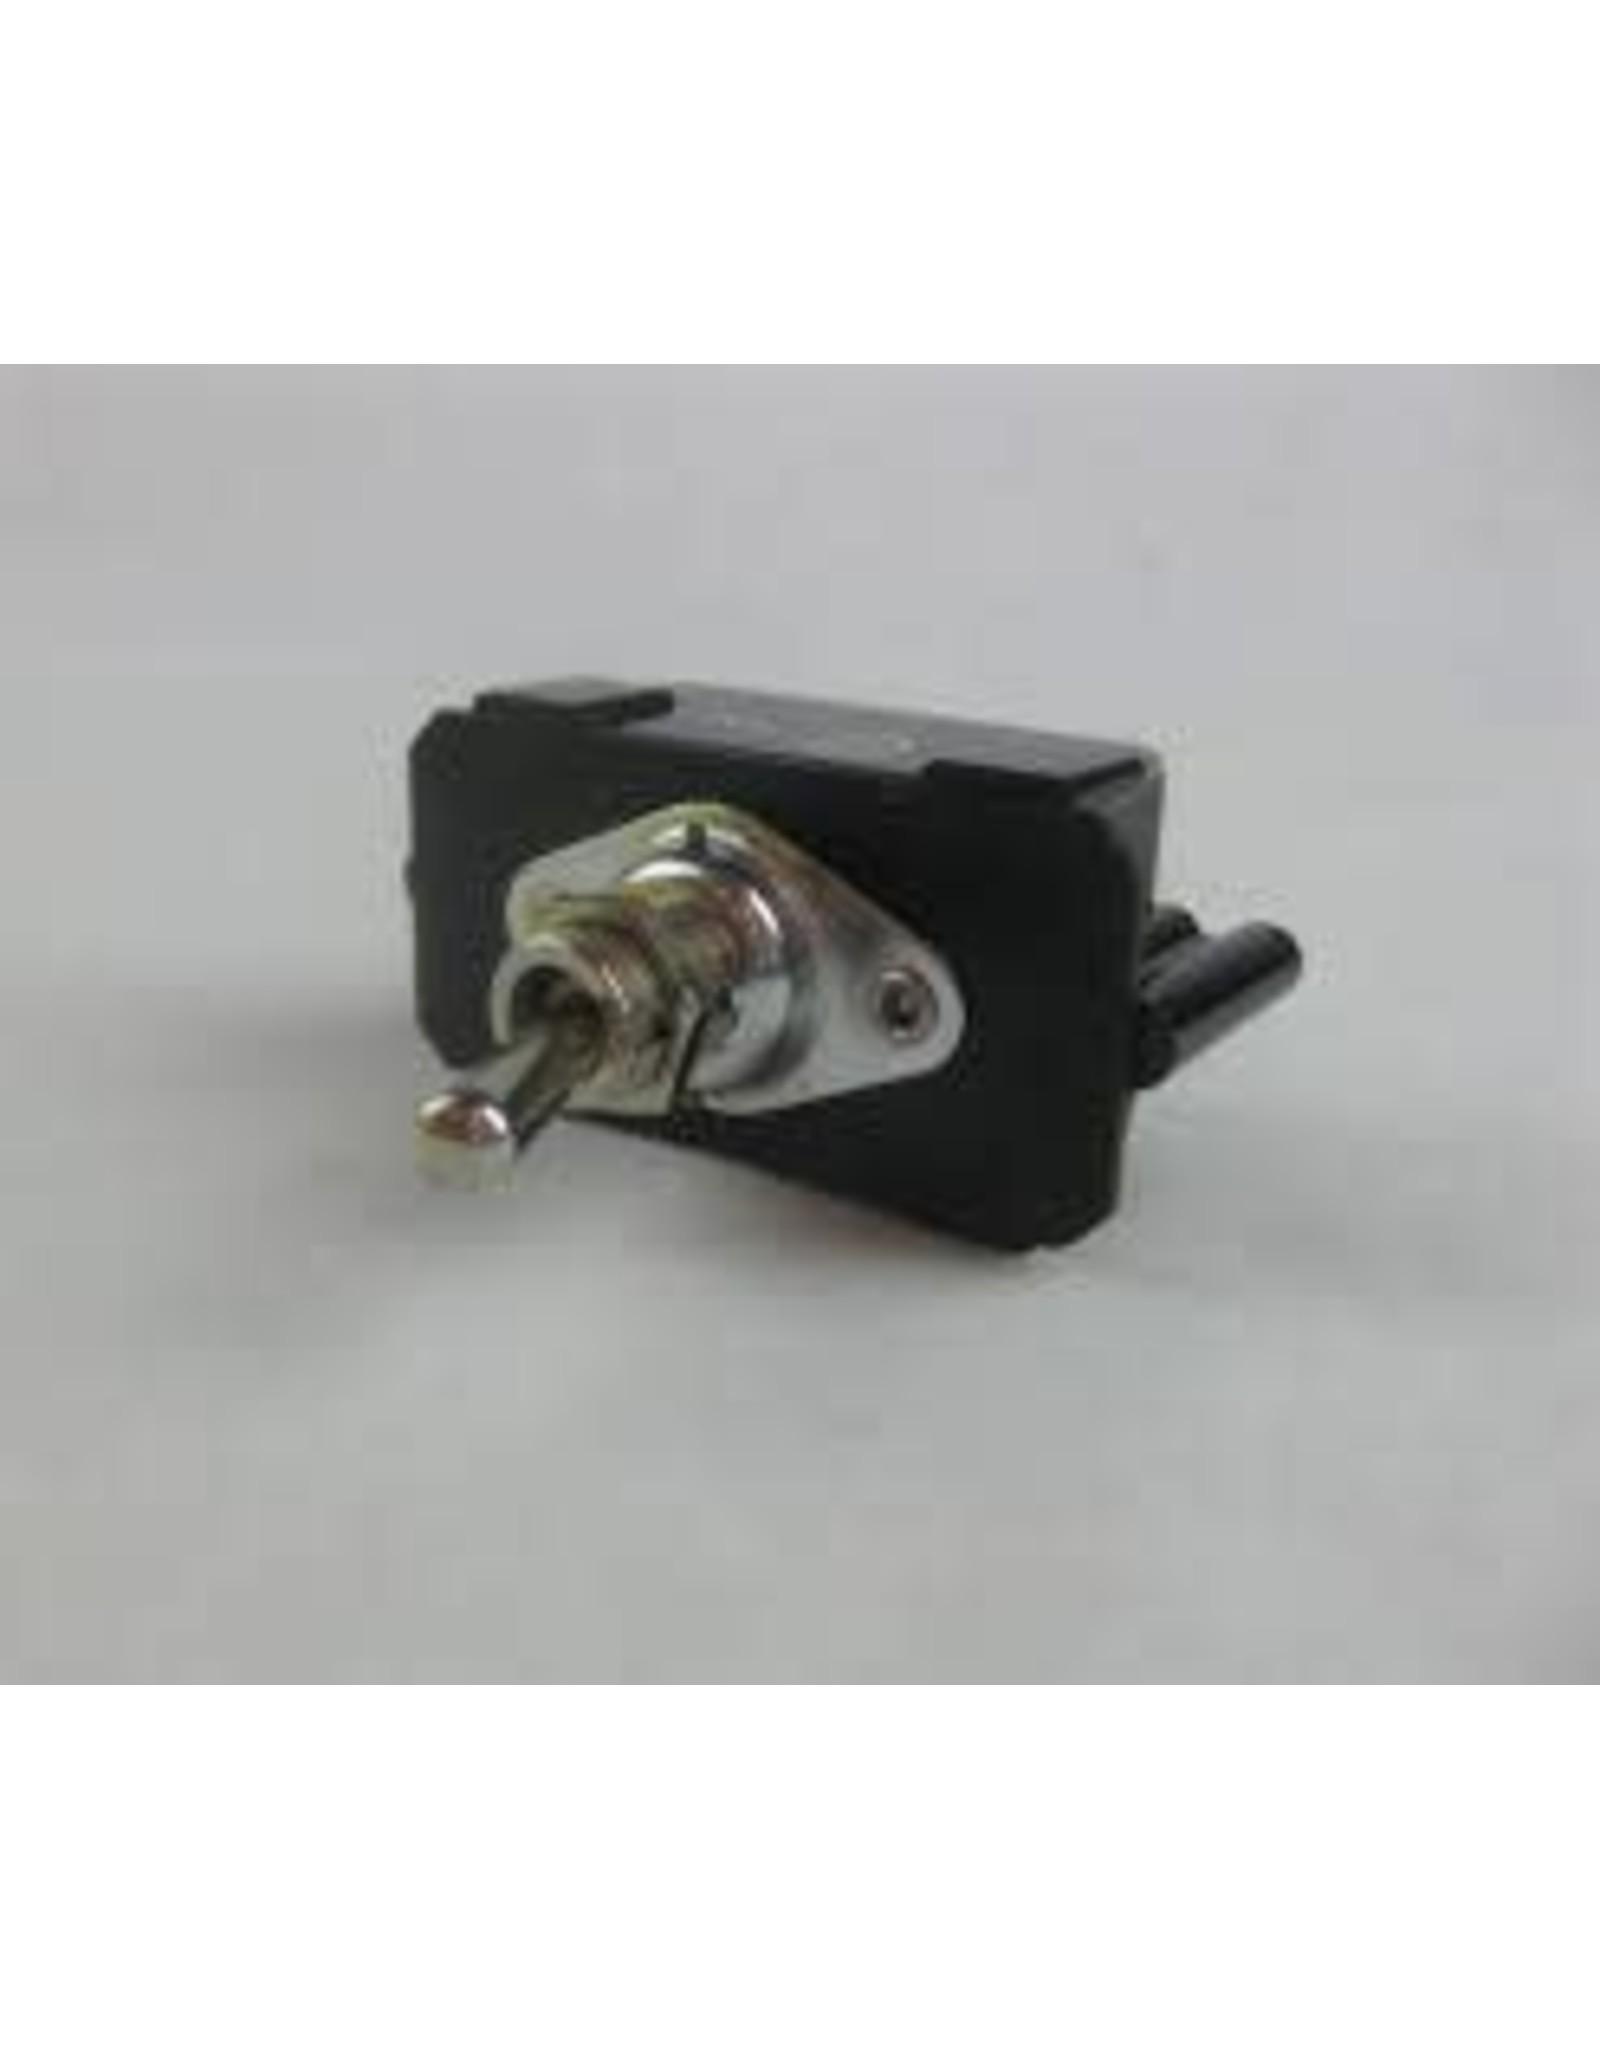 Titan 506-260 Toggle Switch, SpeeFlo